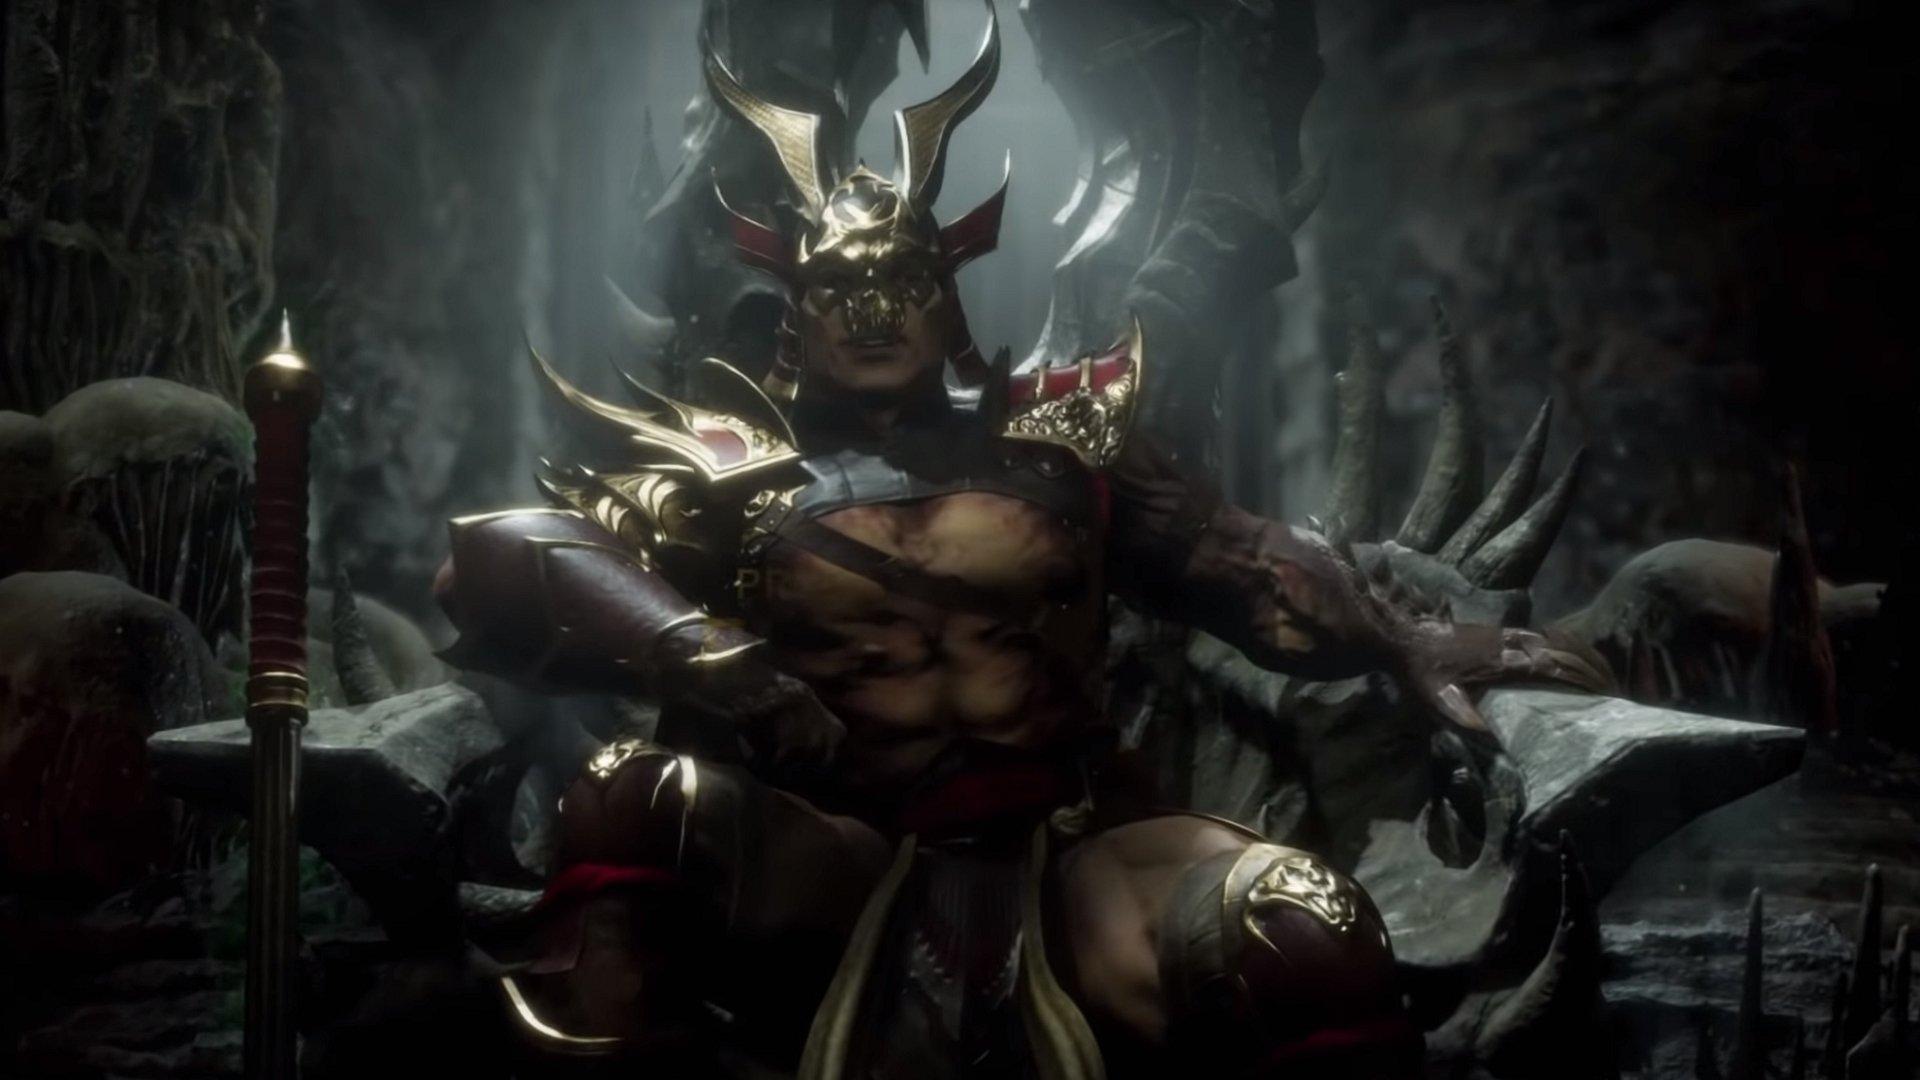 How to get Shao Kahn in Mortal Kombat 11 | AllGamers